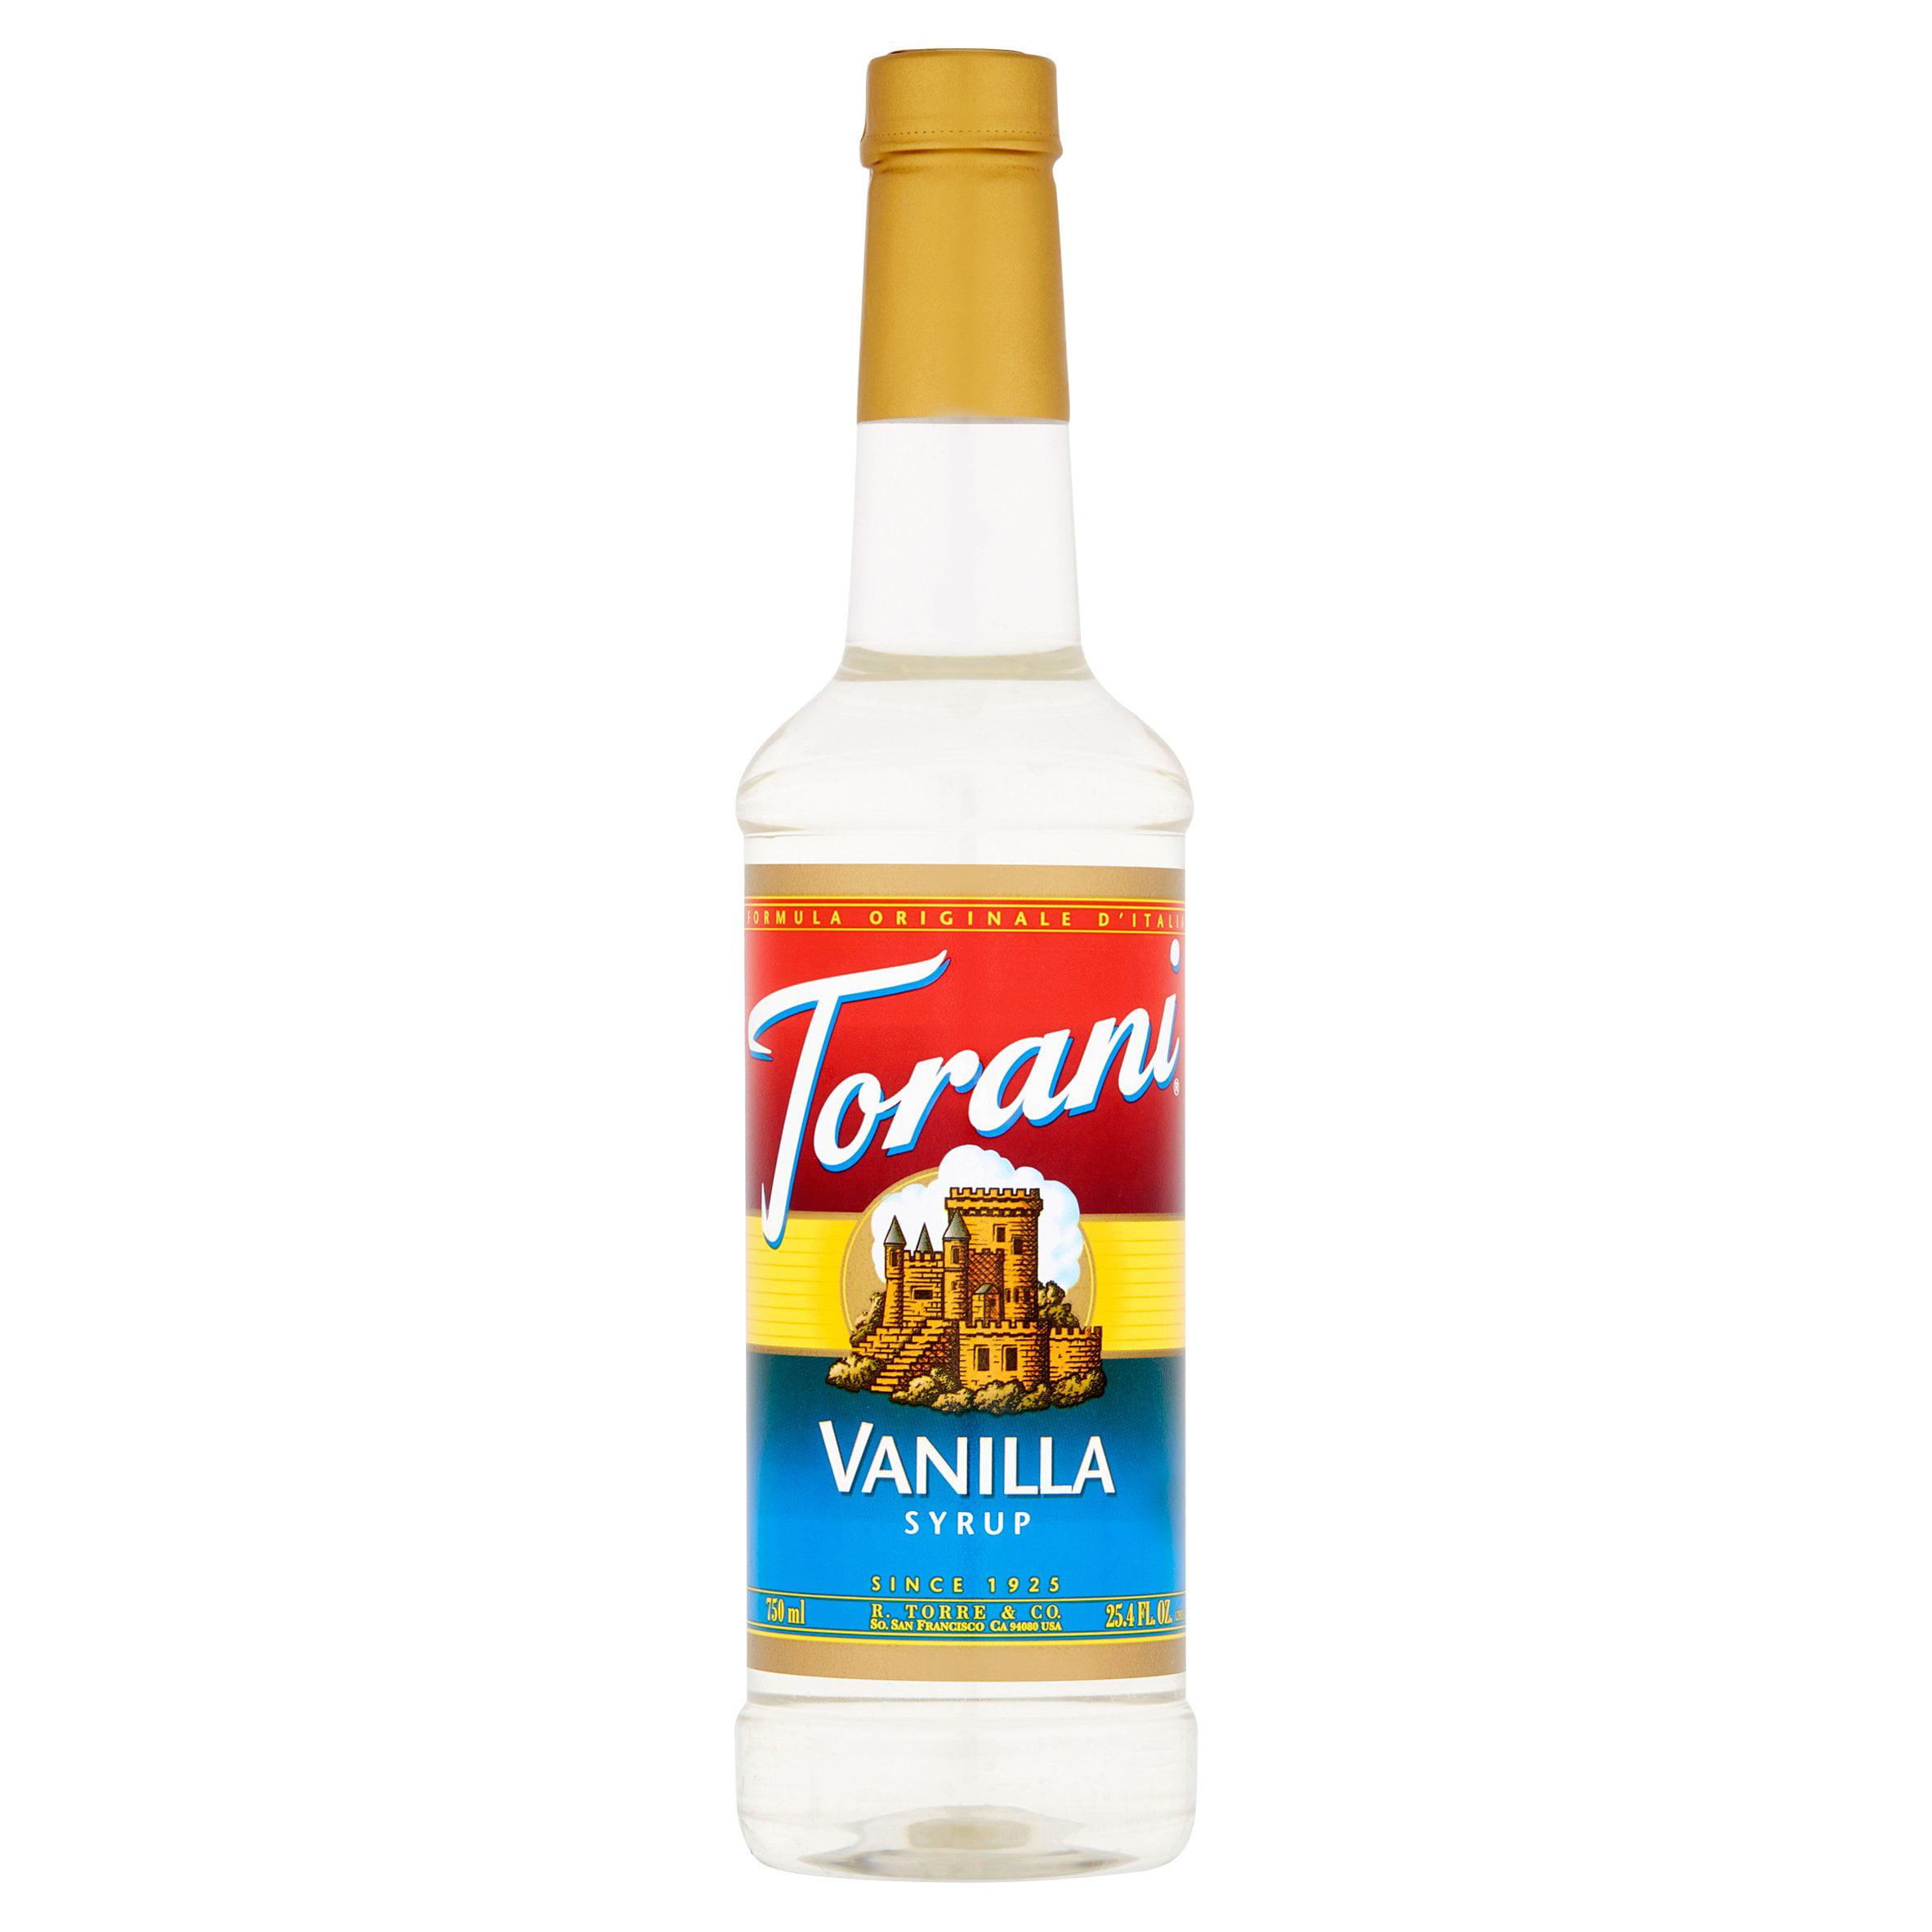 Torani Vanilla Syrup, 25.4 fl oz